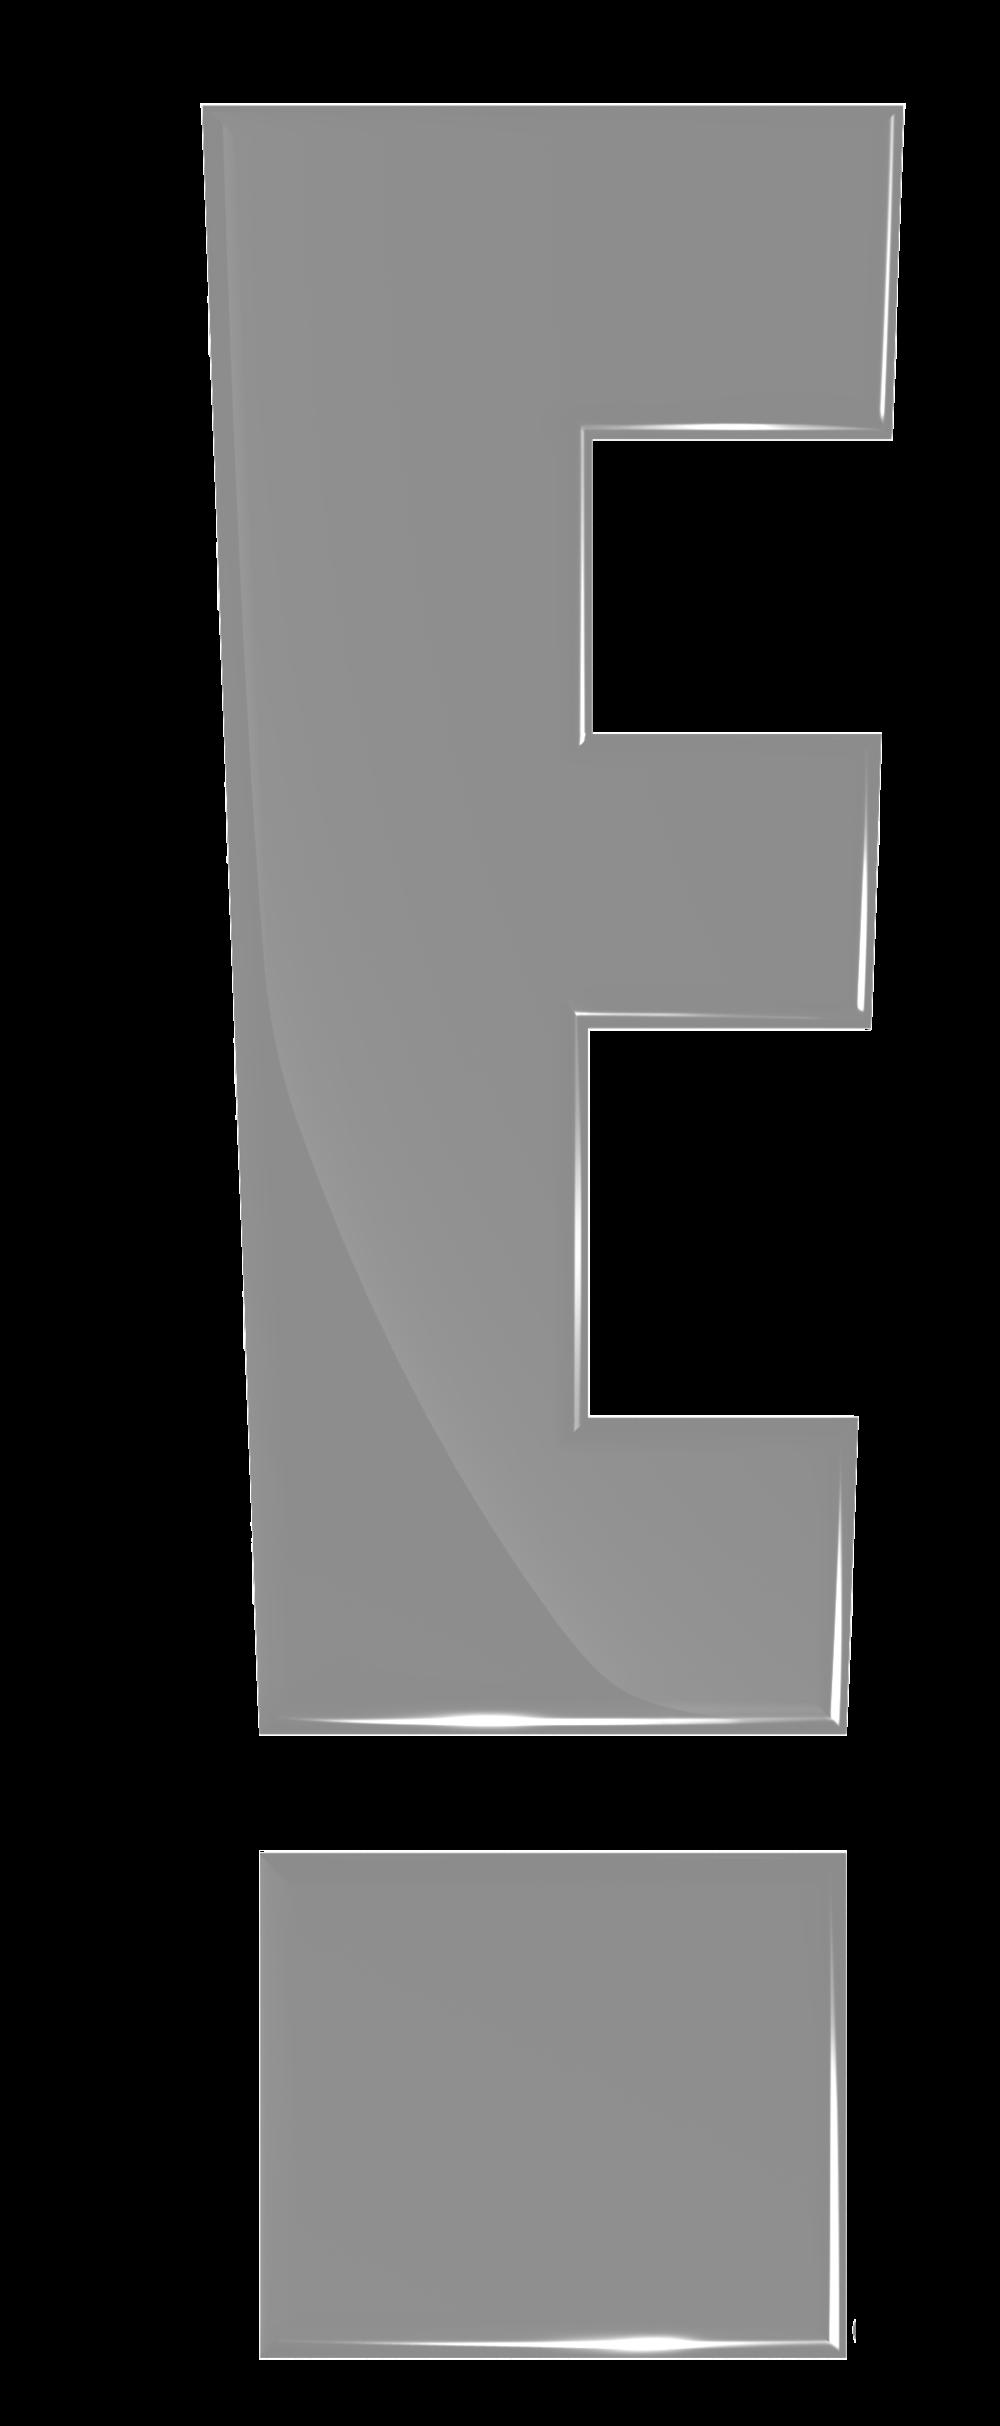 E_Logo_Black.png